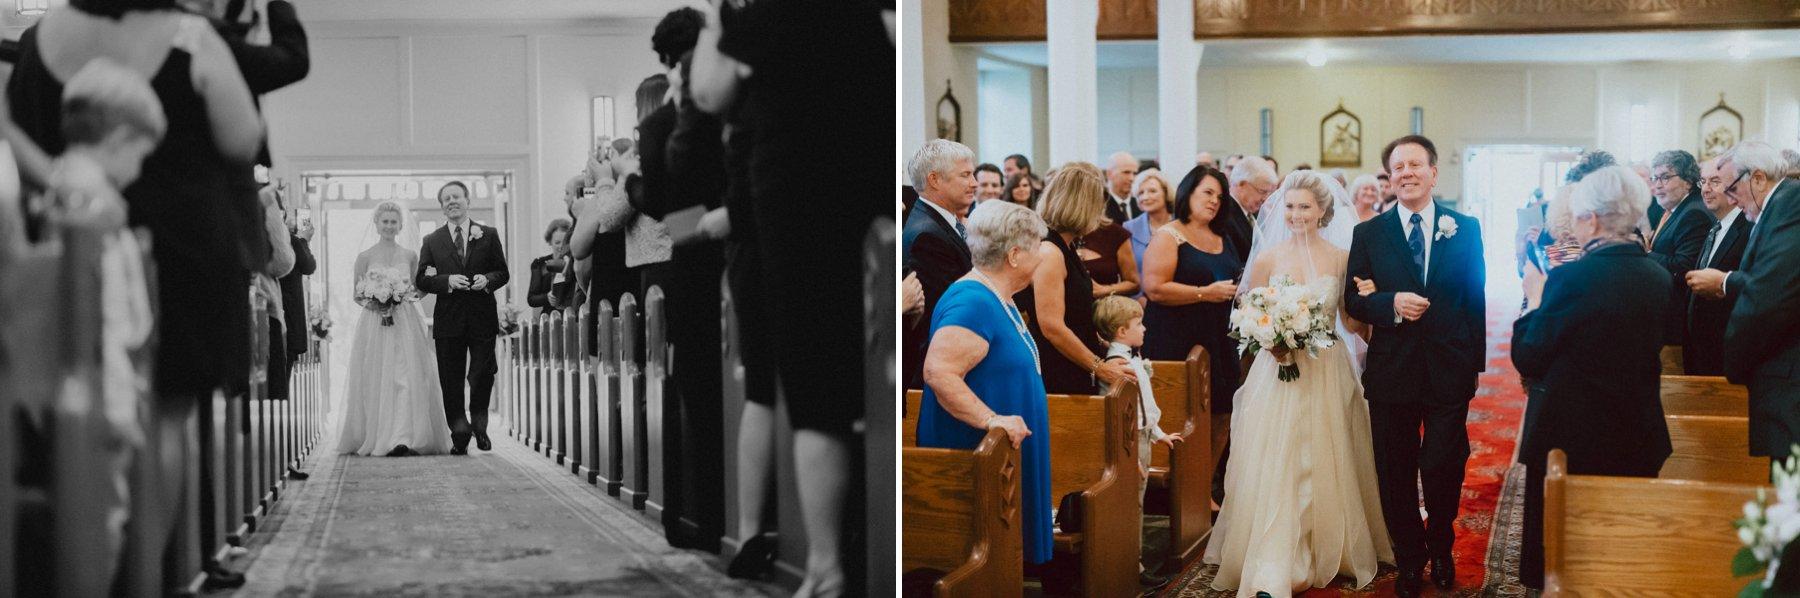 greenville-country-club-wedding-44.jpg